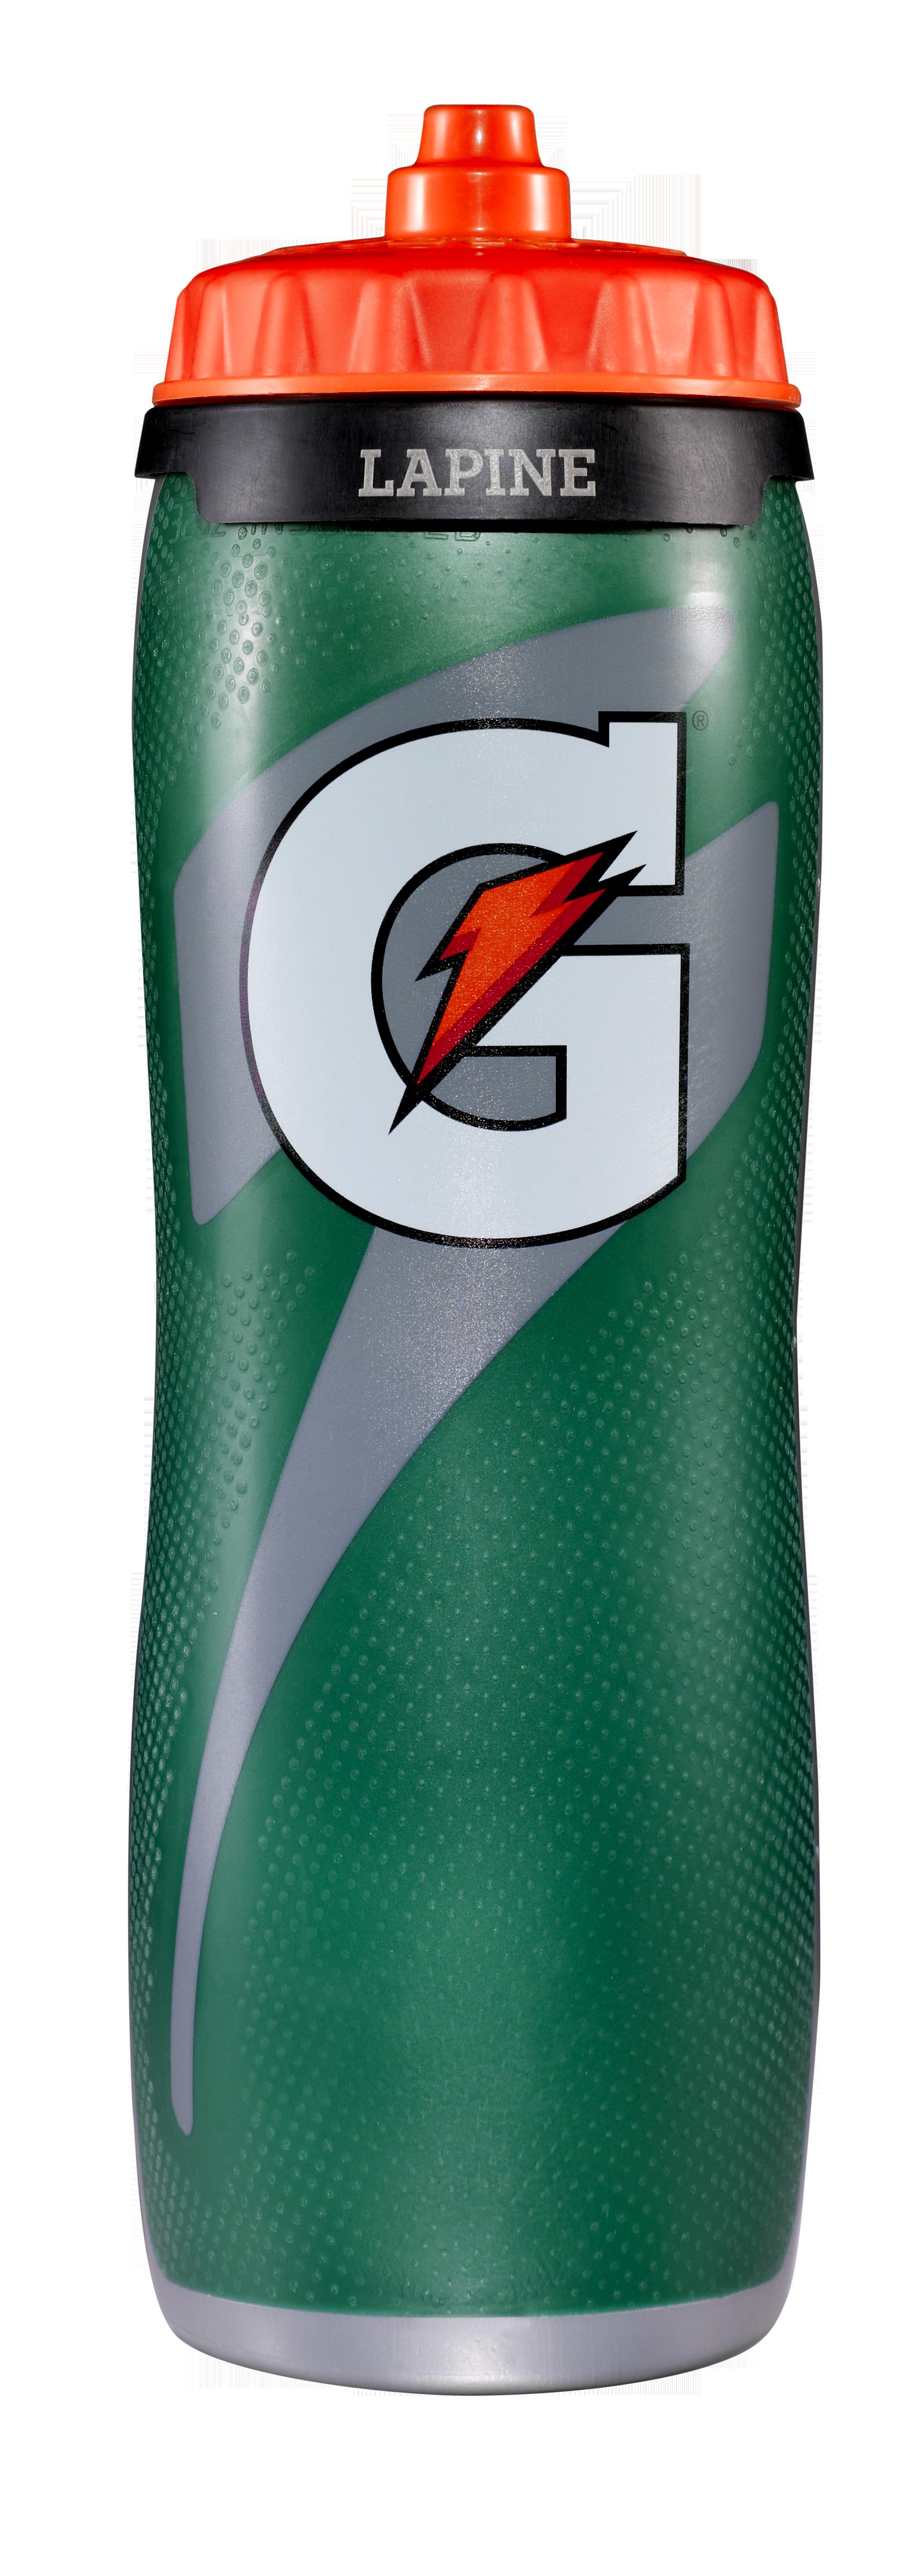 Gatorade bottle png. Pulls genius out of